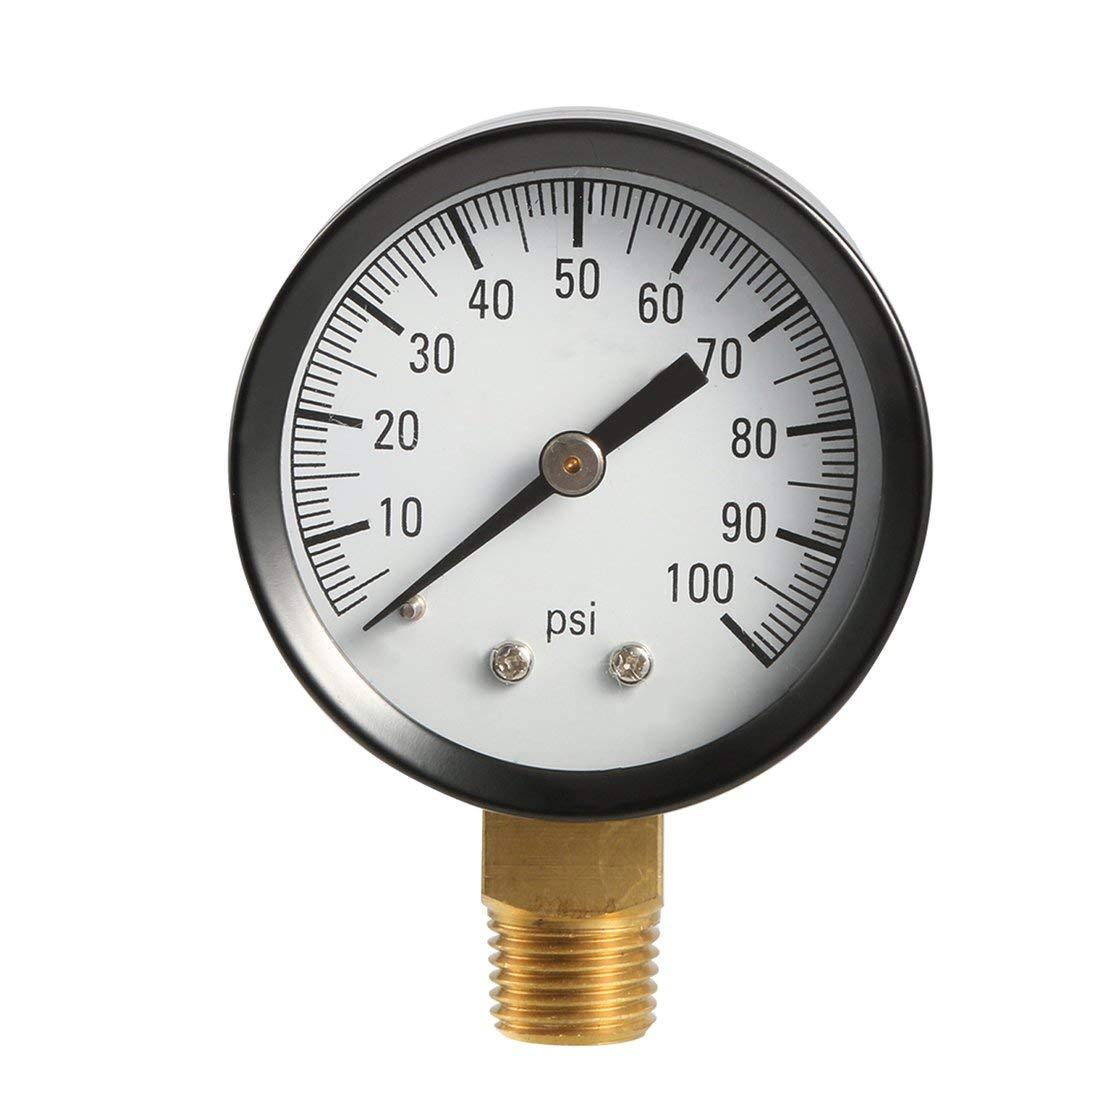 Profesional 1305 0-100 PSI 1//4 pulgadas NPT macho bomba de pozo Man/ómetro de presi/ón de aire man/ómetro de presi/ón de aire TS50-100PSI